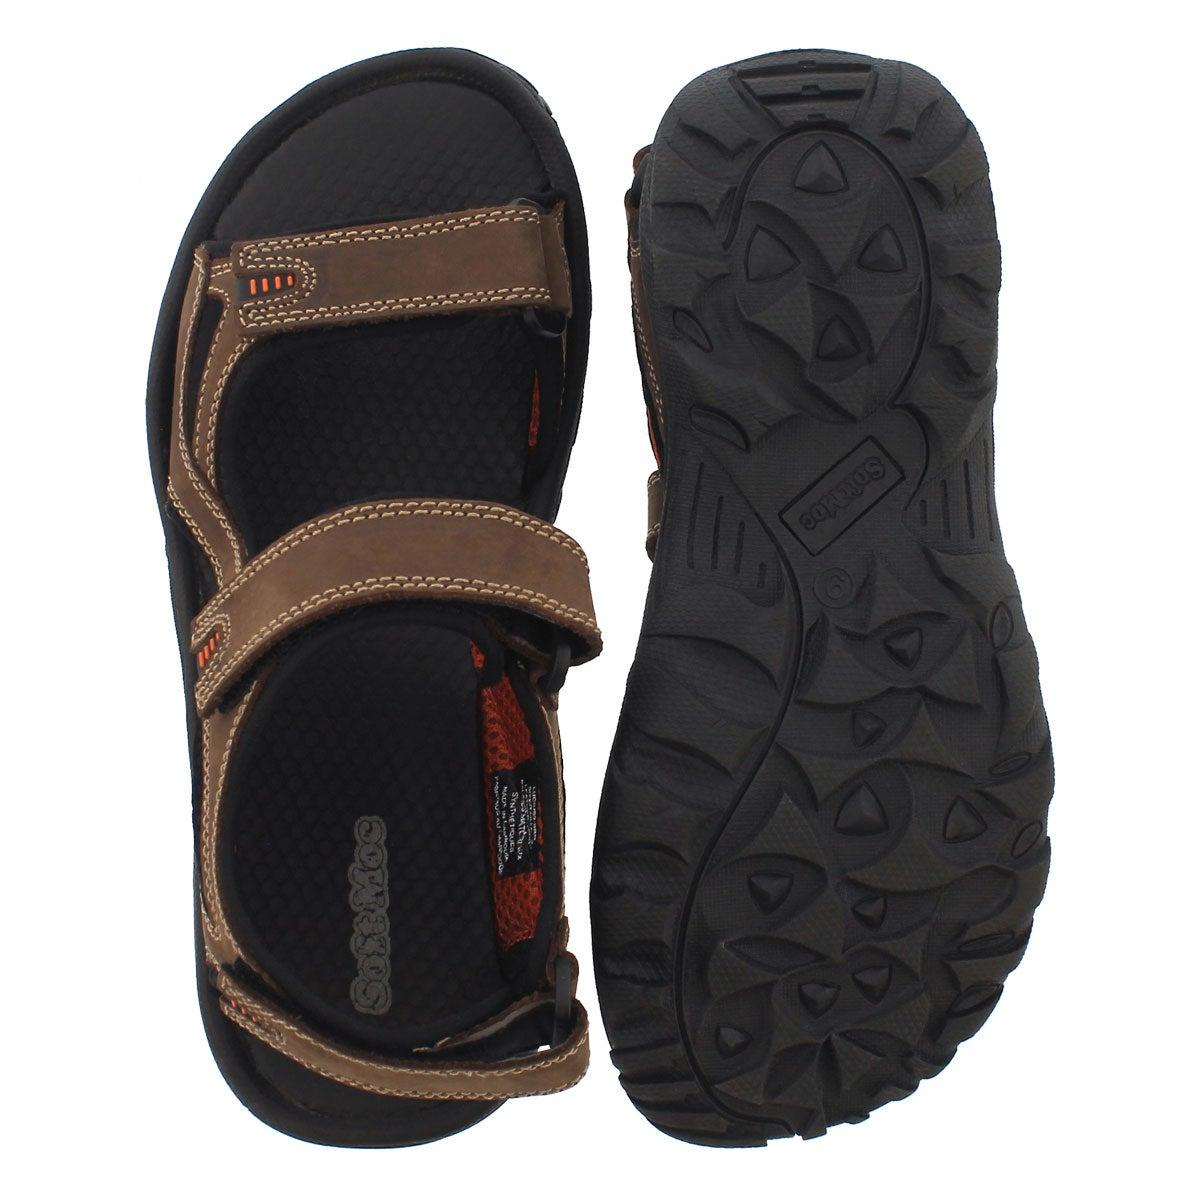 Mns Lucius 2 brown 3 strap sandal